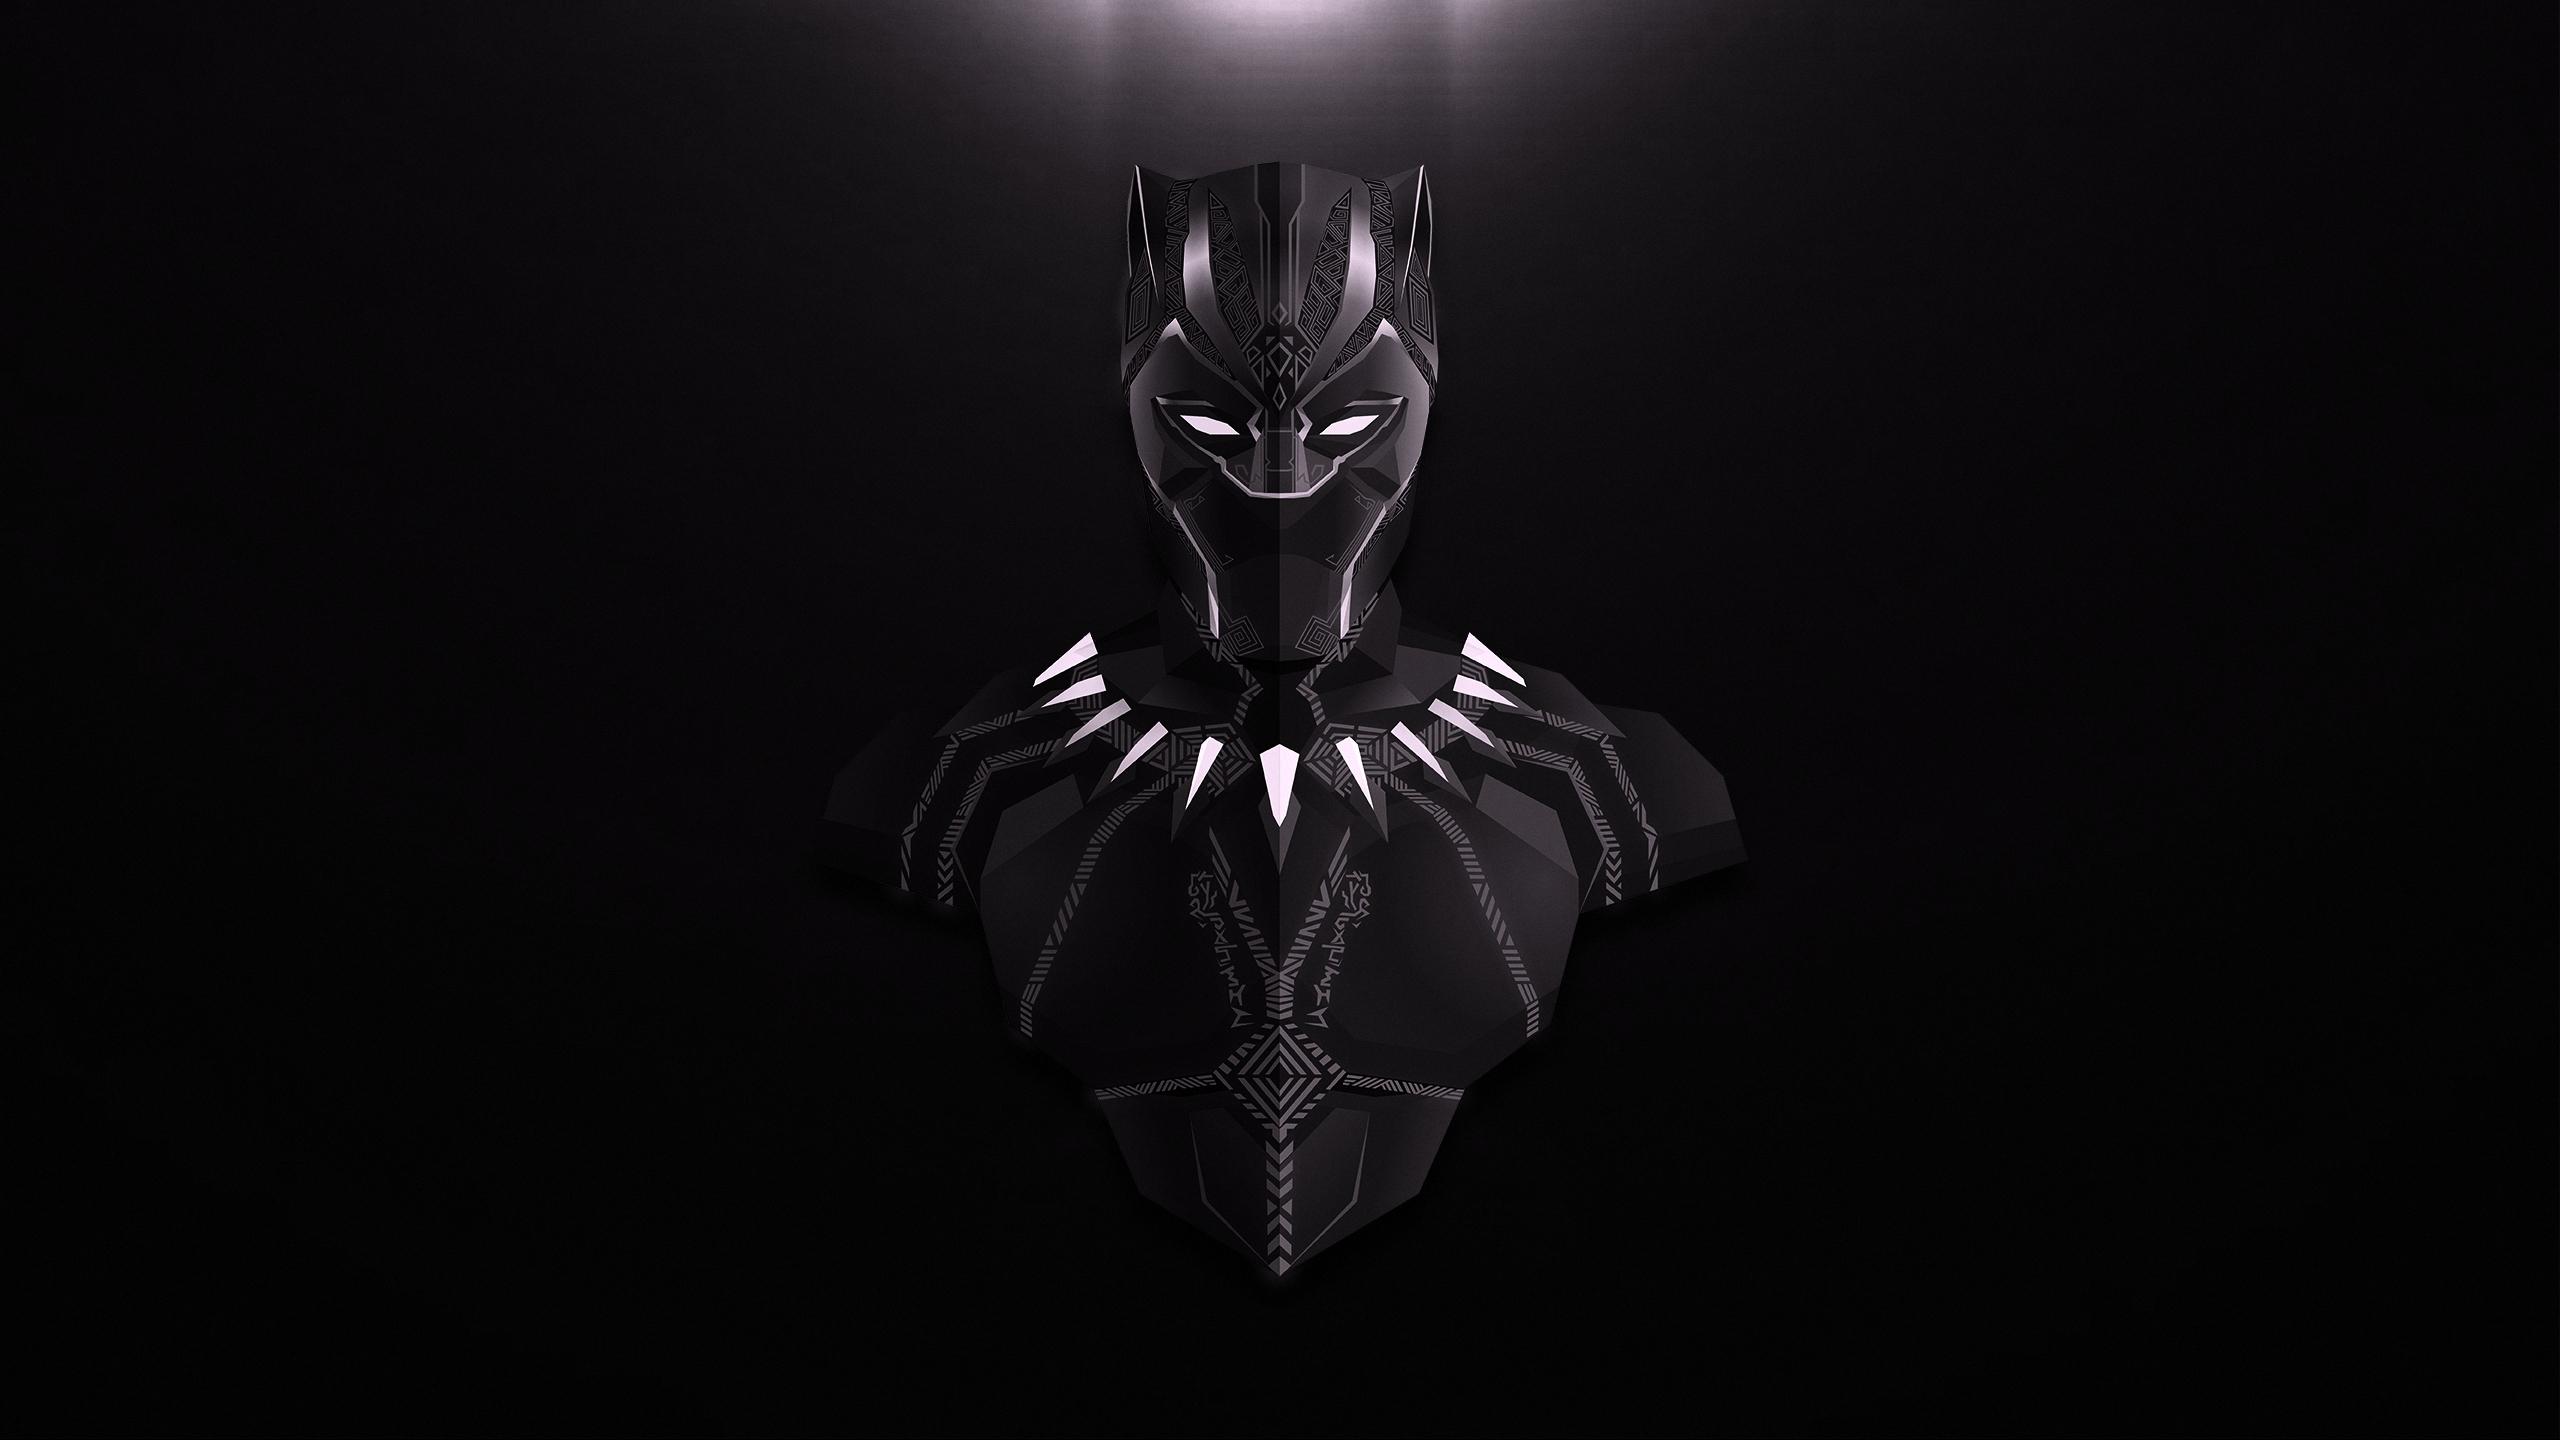 Black Panther Lowpoly Minimalist, HD Superheroes, 4k ...